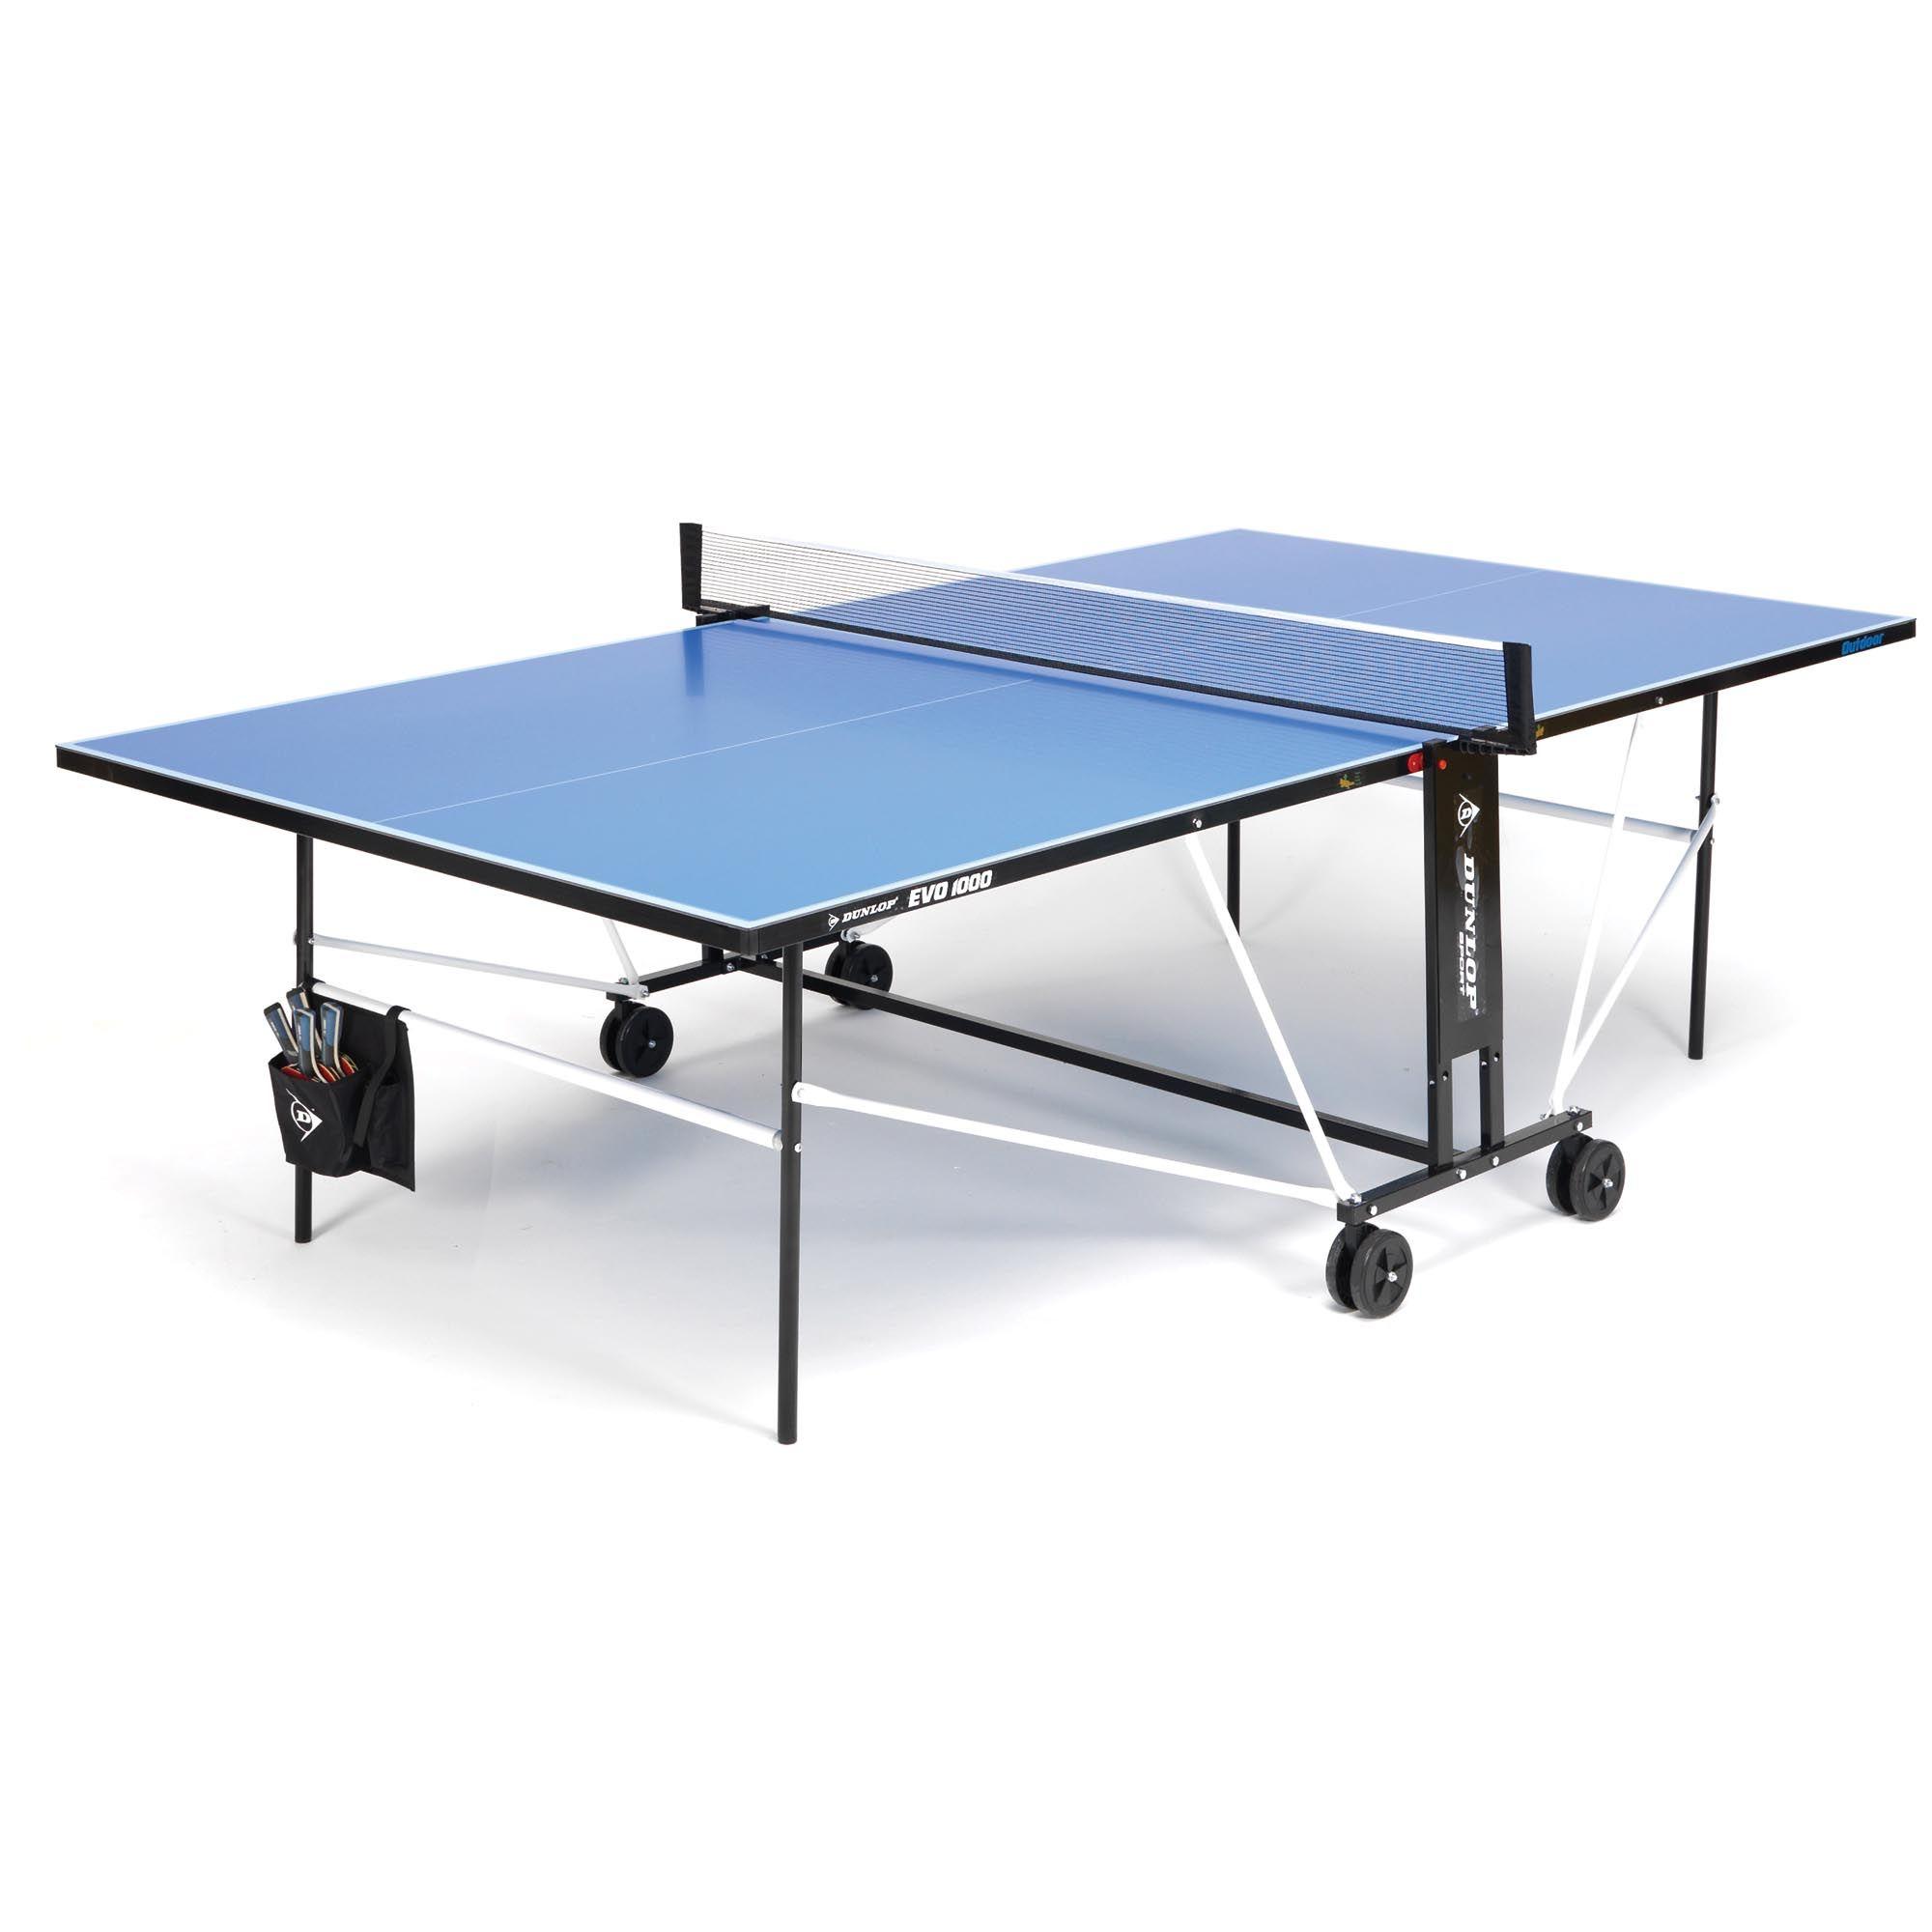 Dunlop EVO 1000 Outdoor Table Tennis Table Sweatband